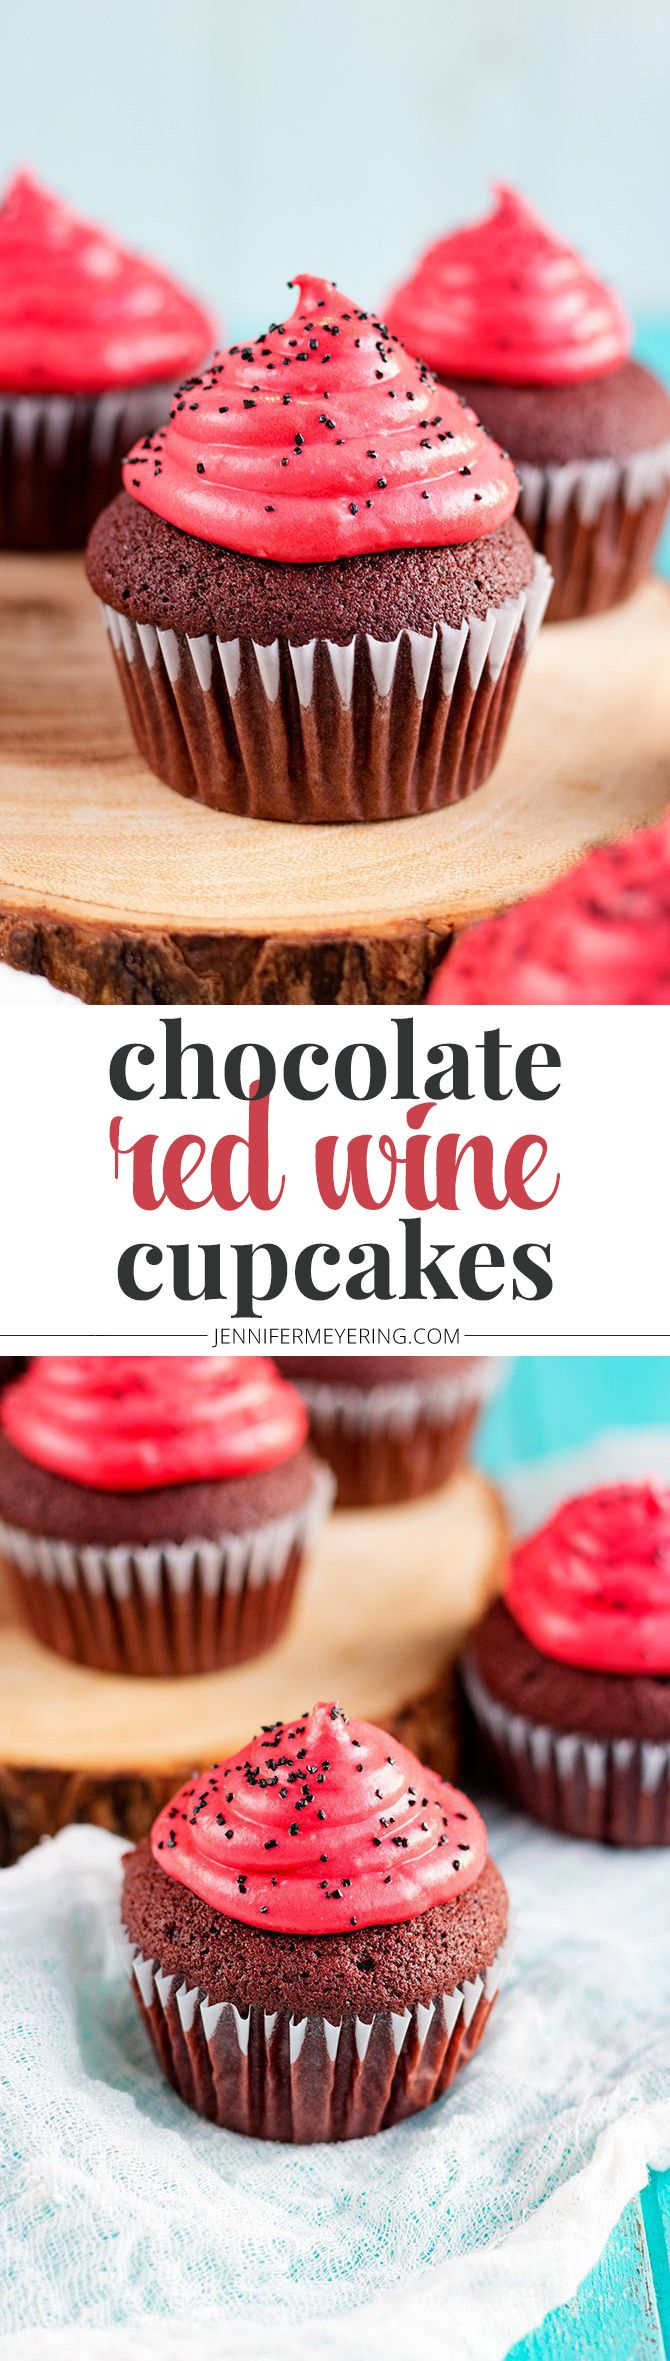 Chocolate Red Wine Cupcakes - JenniferMeyering.com